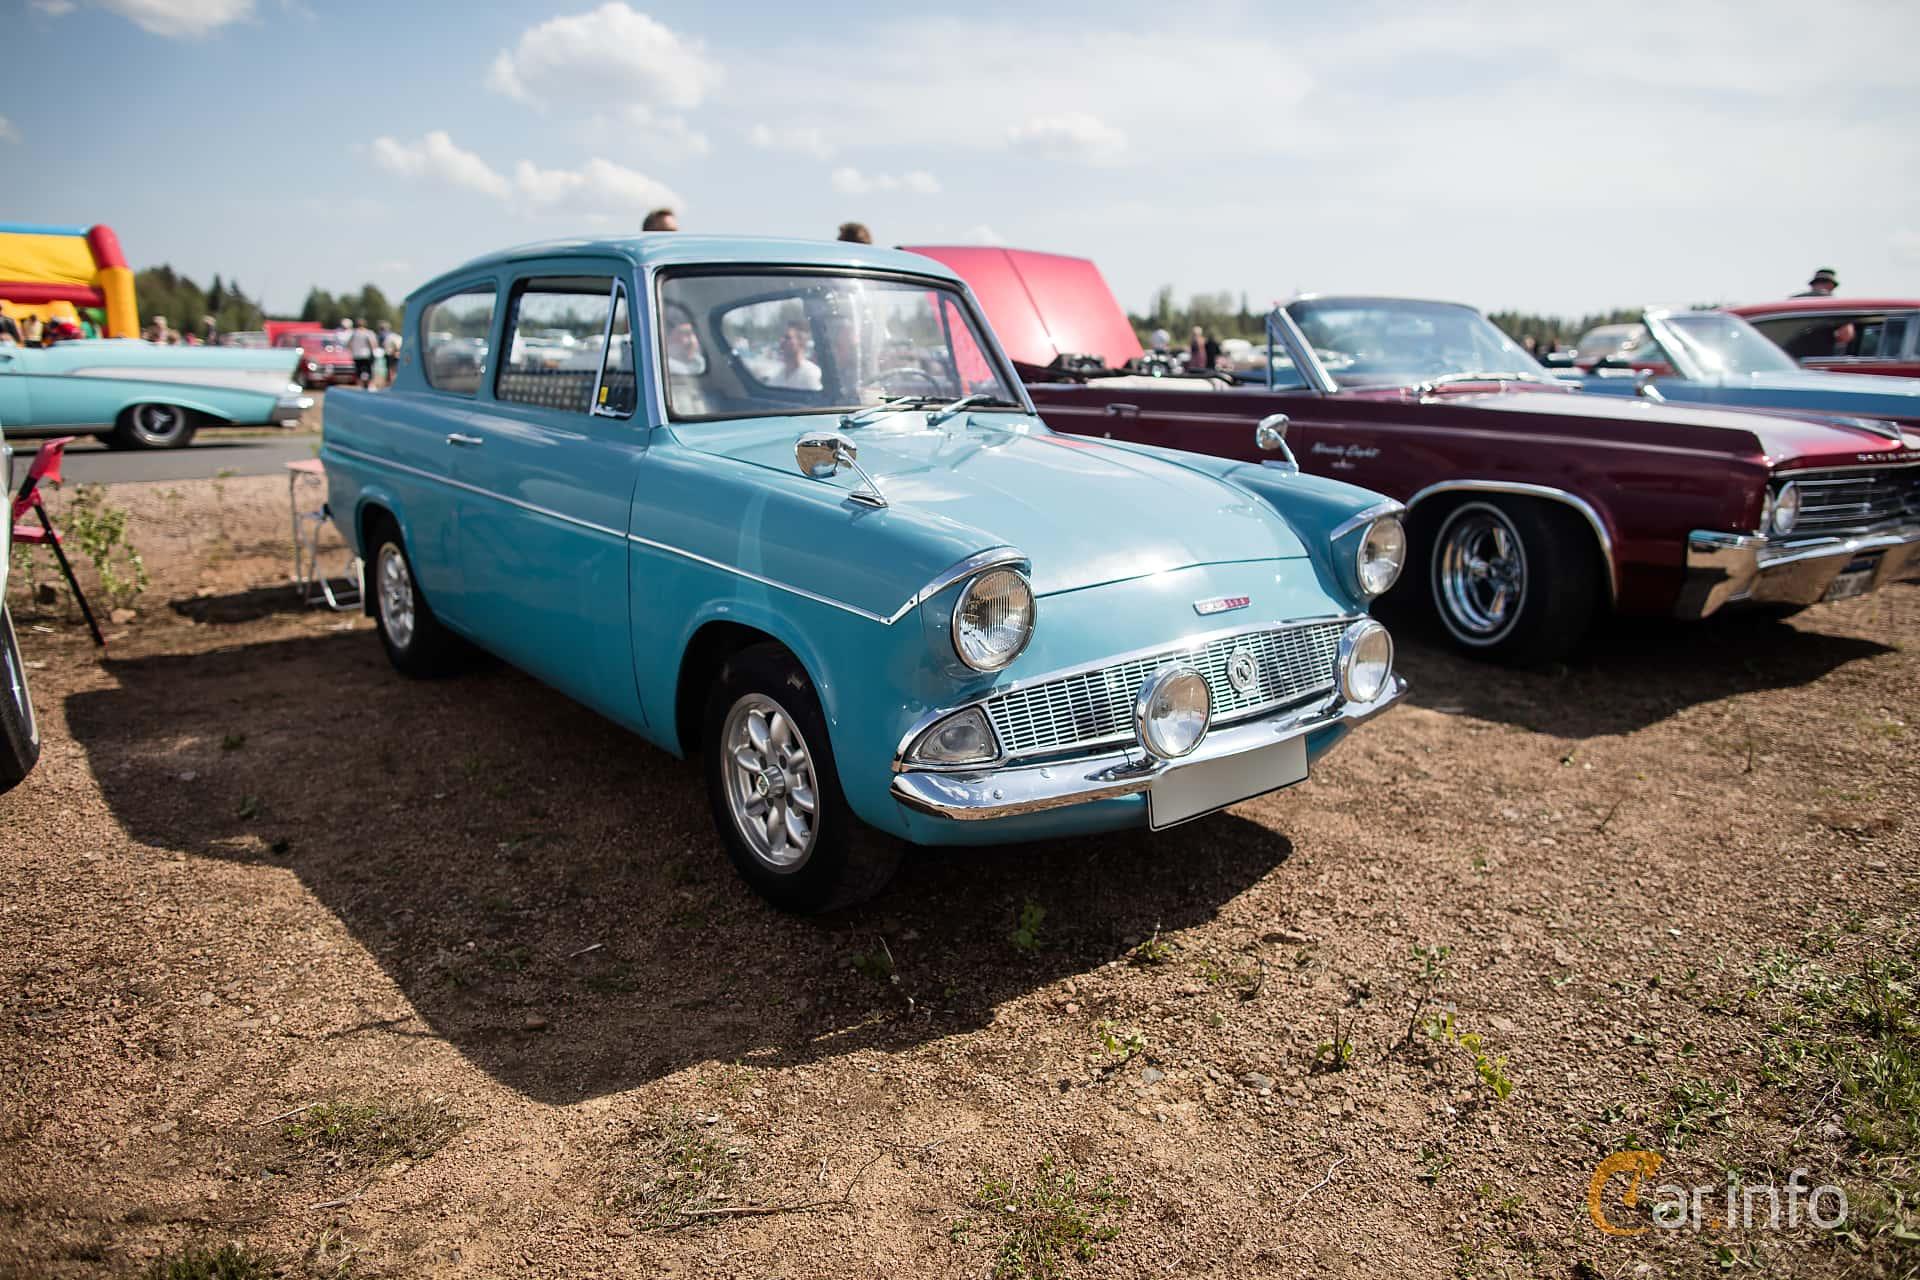 Ford Anglia 1.0 Manual, 39hp, 1962 at Riksettanrallyt 2018